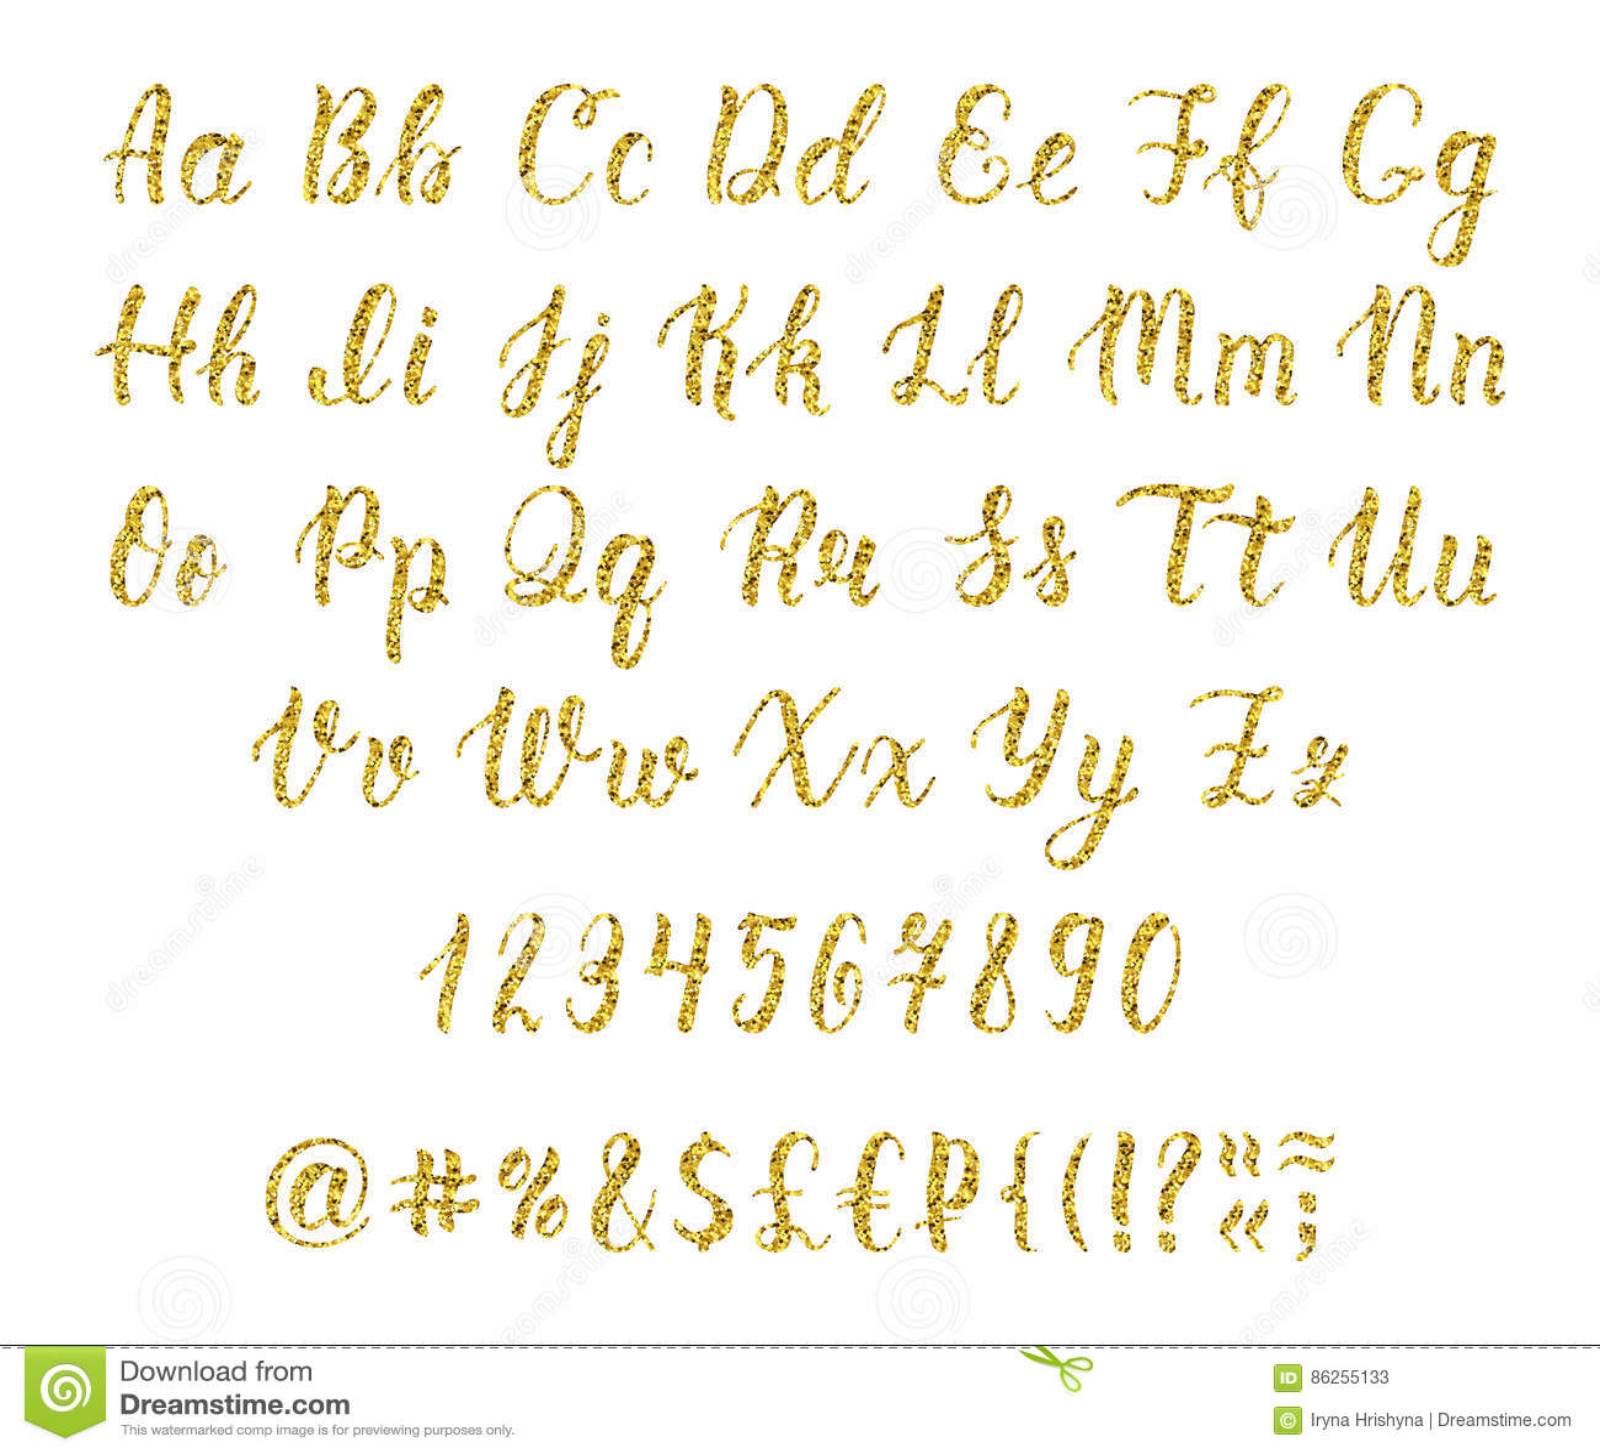 Handwritten latin calligraphy brush script with numbers and handwritten latin calligraphy brush script with numbers and punctuation marks gold glitter alphabet vector buycottarizona Choice Image